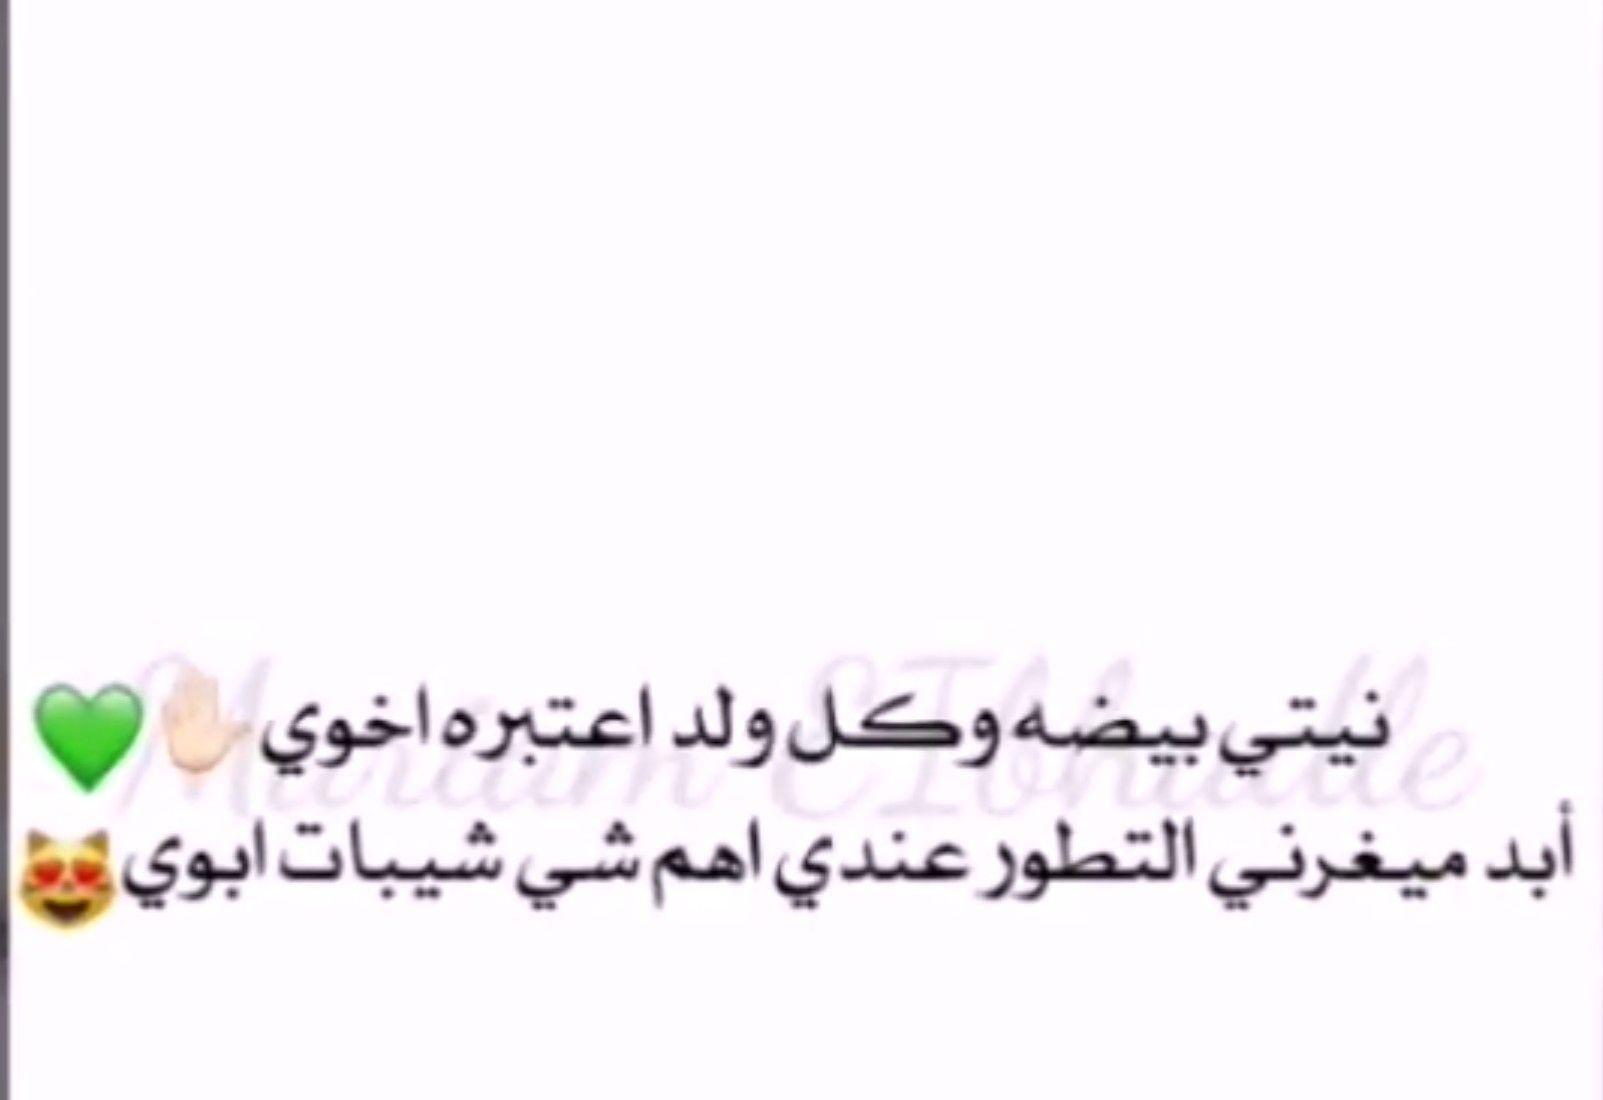 Pin By فلسطينية ولي الفخر On كلام معسول Calligraphy Arabic Calligraphy